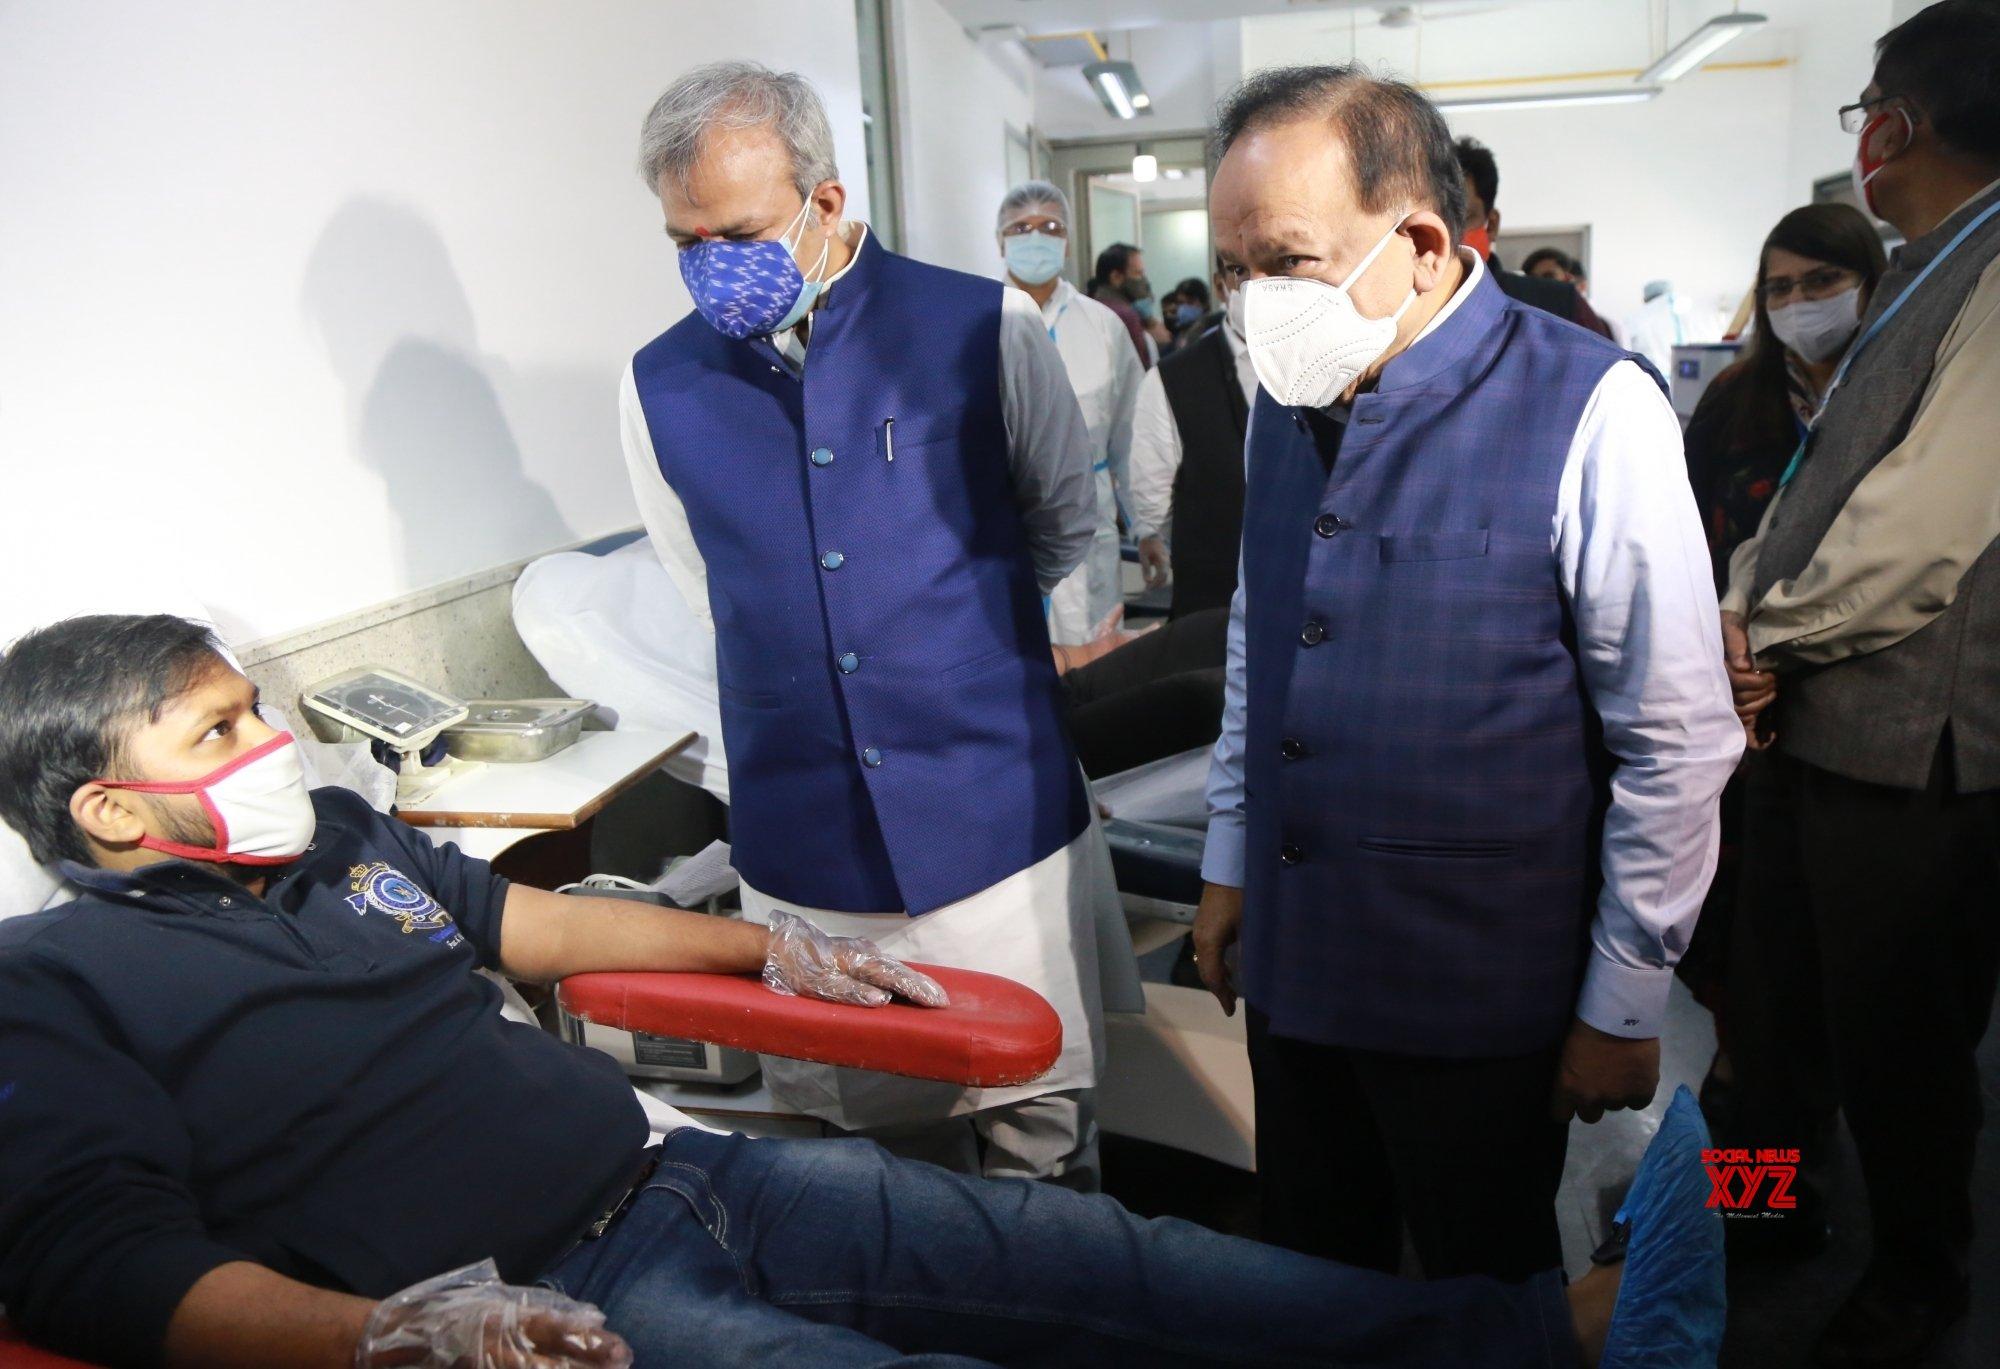 New Delhi: BJP Yuva Morcha organises blood donation camp for Corona warriors at the Indian Red Cross Society #Gallery